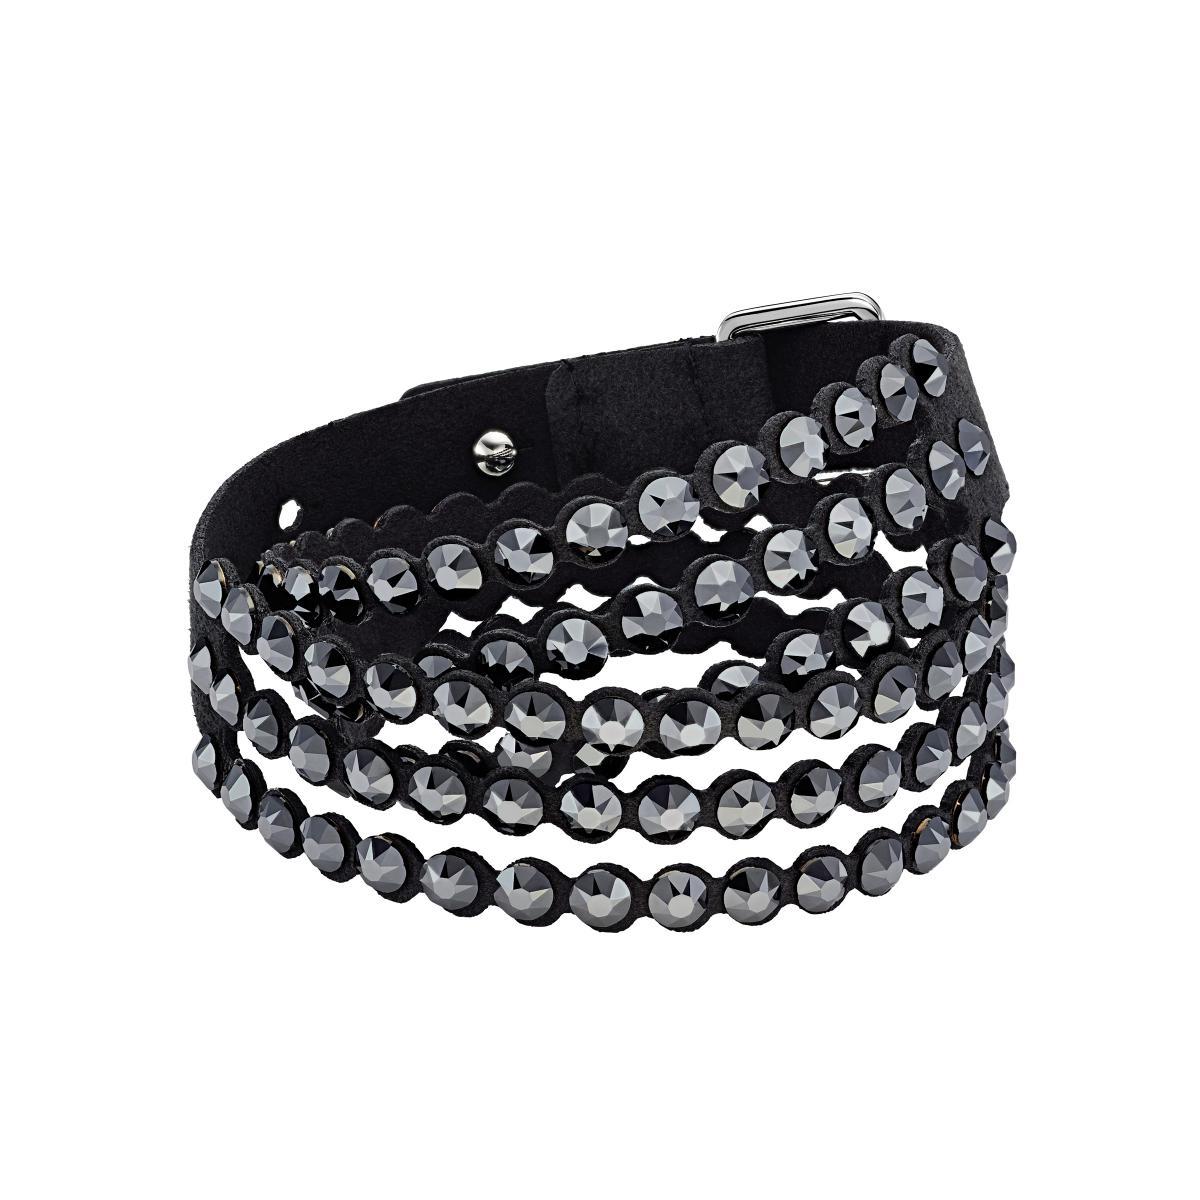 Bracelet Swarovski 5512512 - Iconique Slake Cristaux Noirs Tissu Alcantara®  Femme